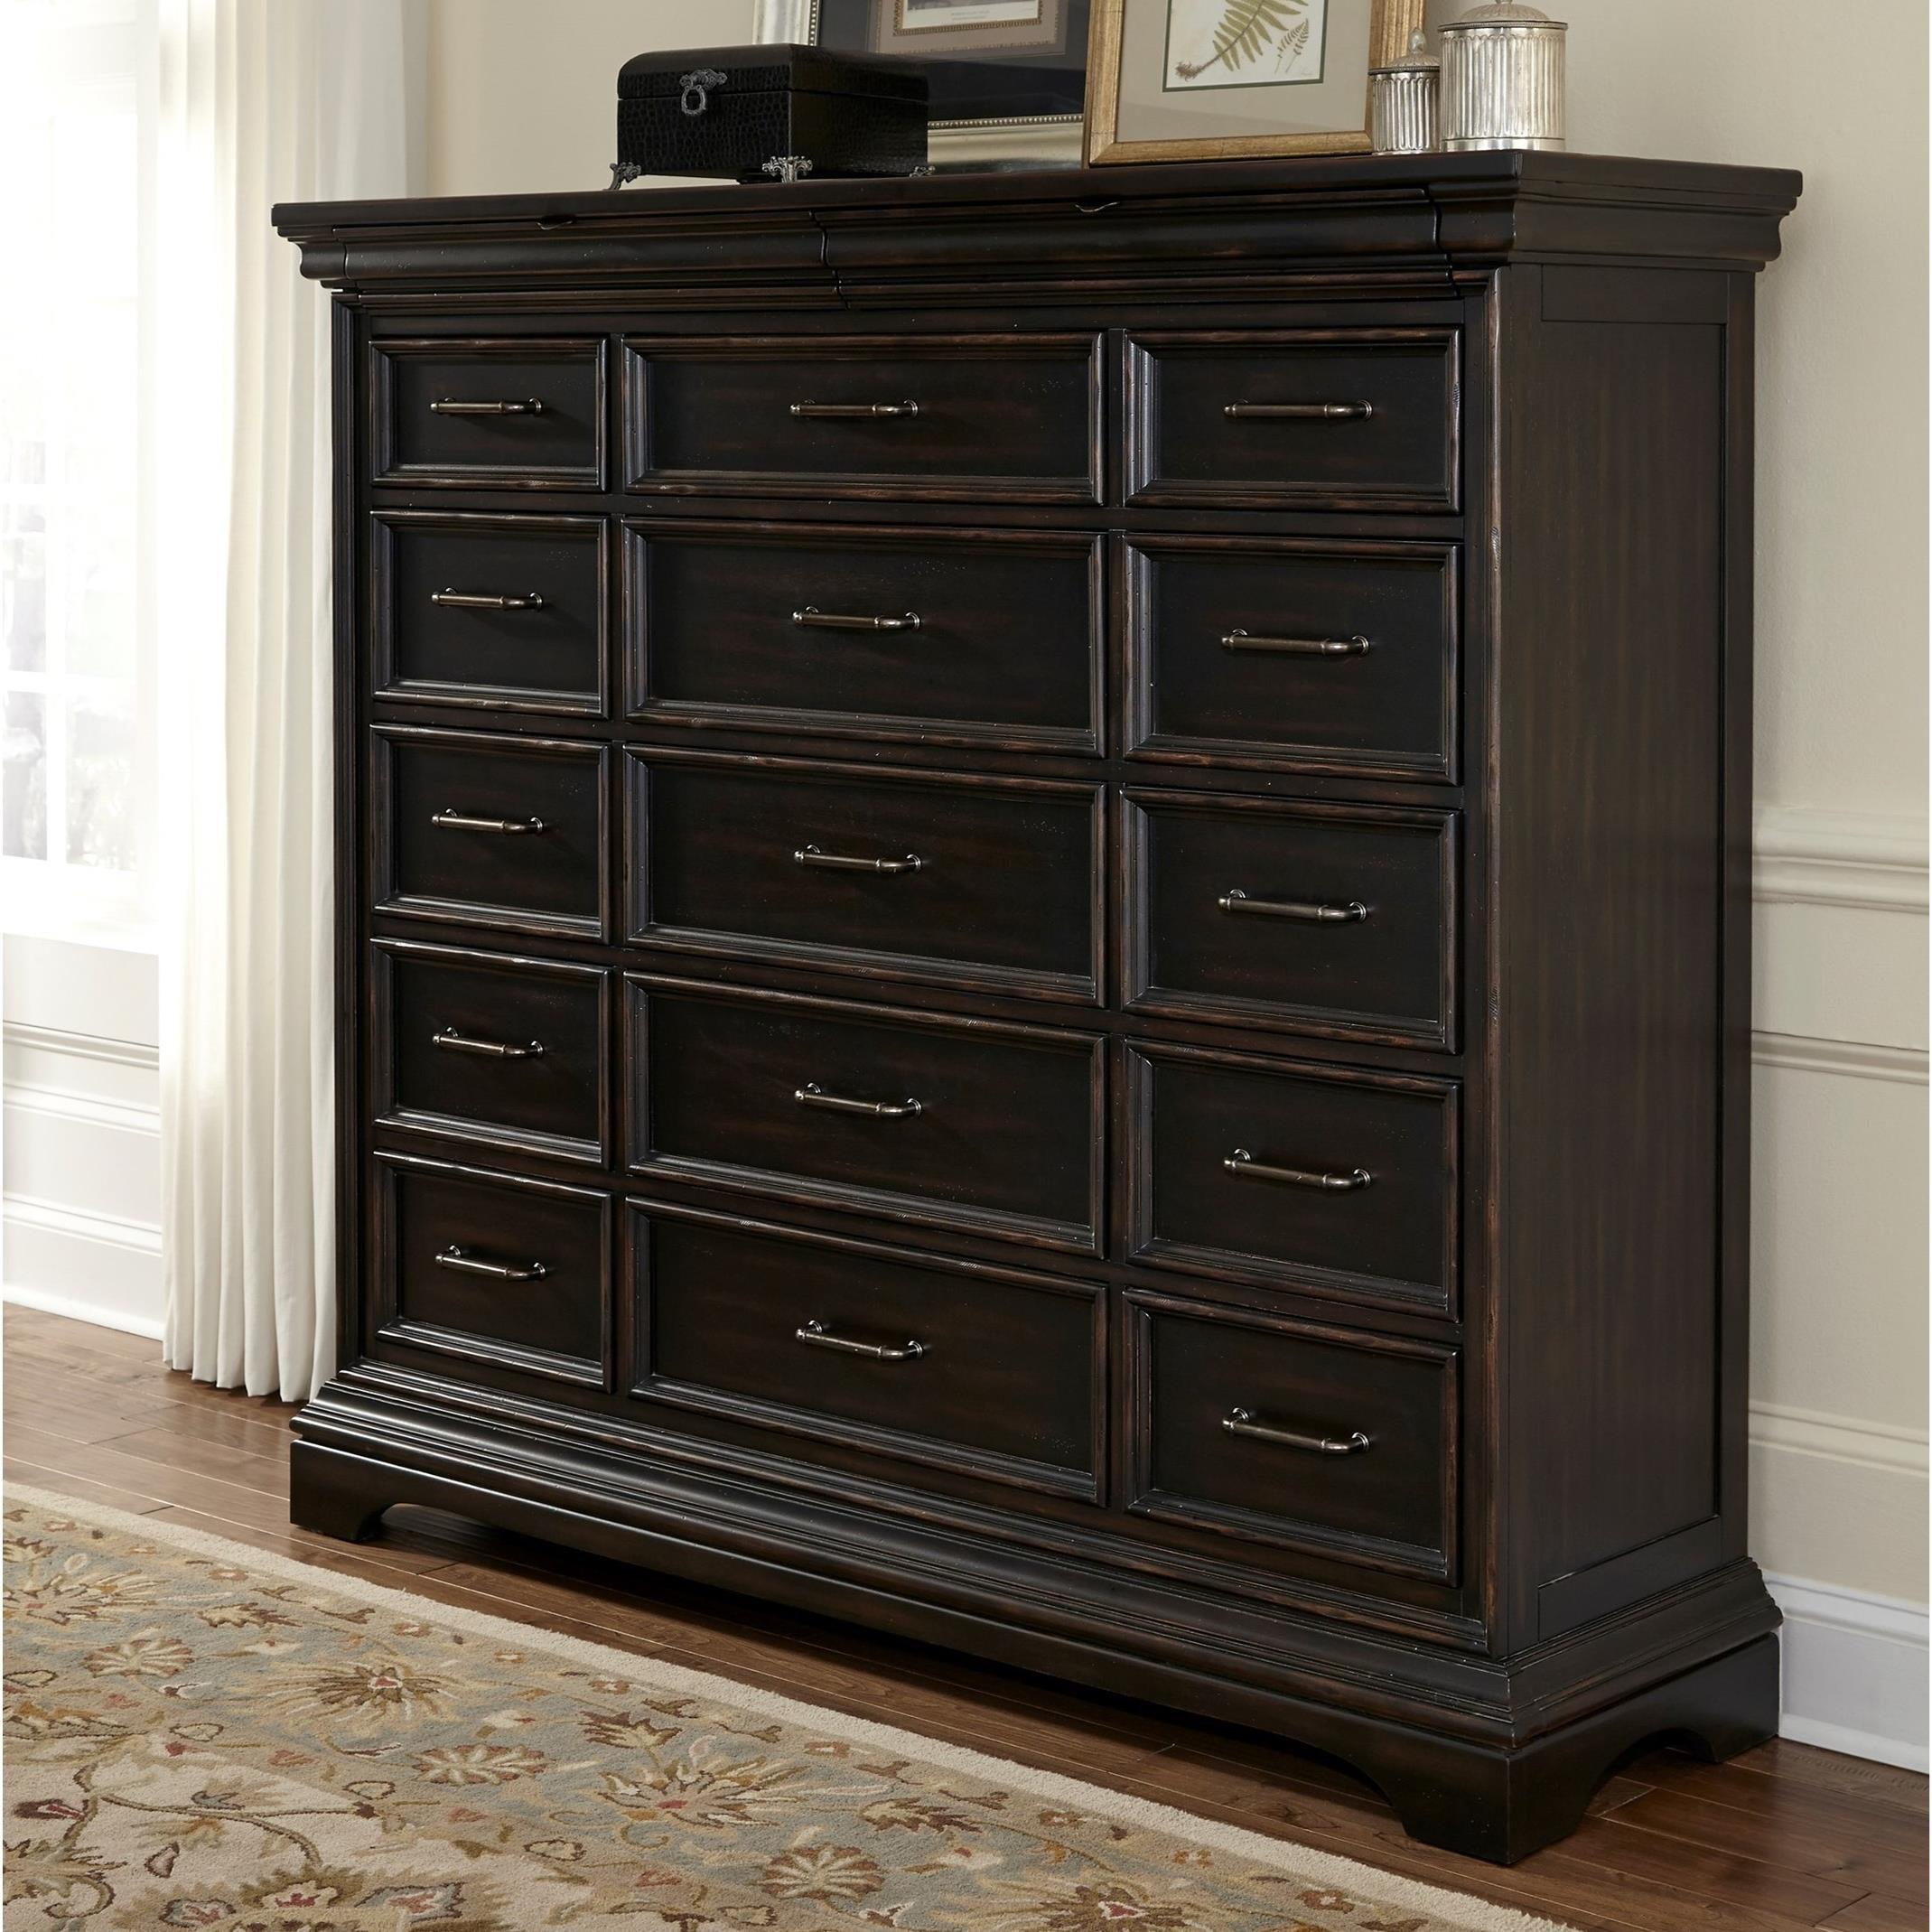 Pulaski Furniture Caldwell 17 Drawer Master Chest